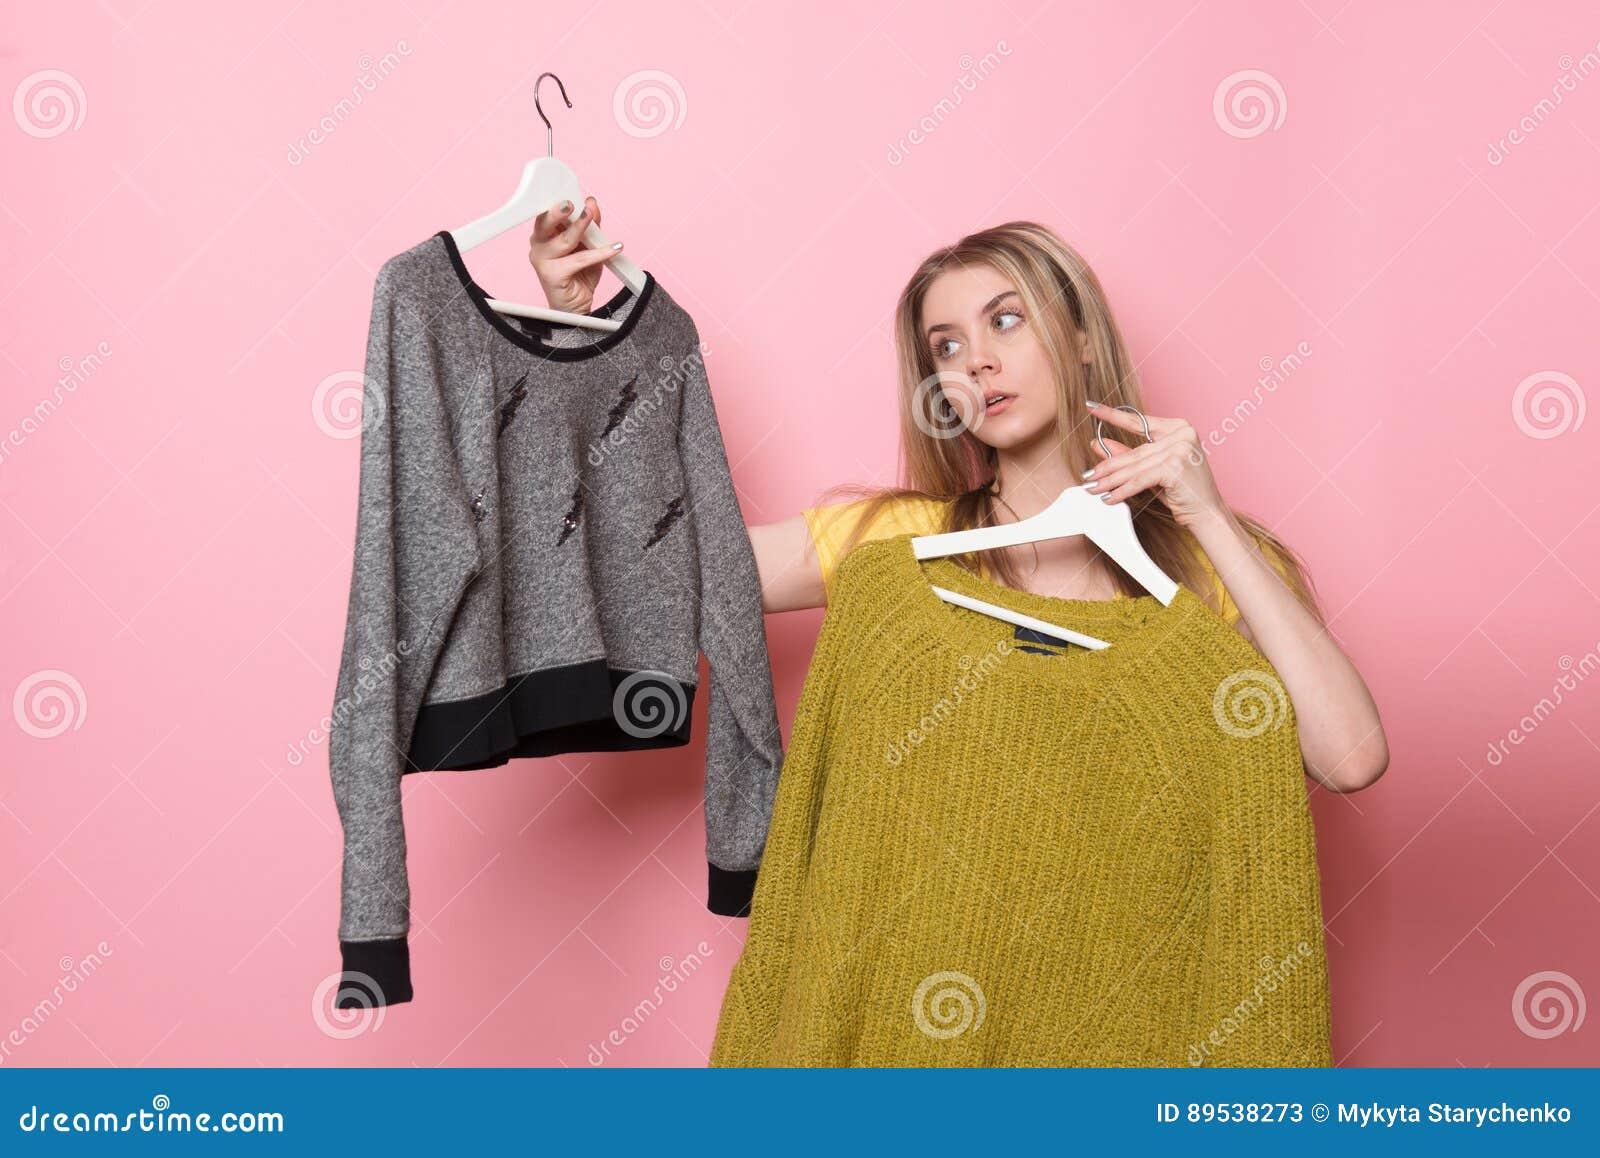 Adult indecisions shop